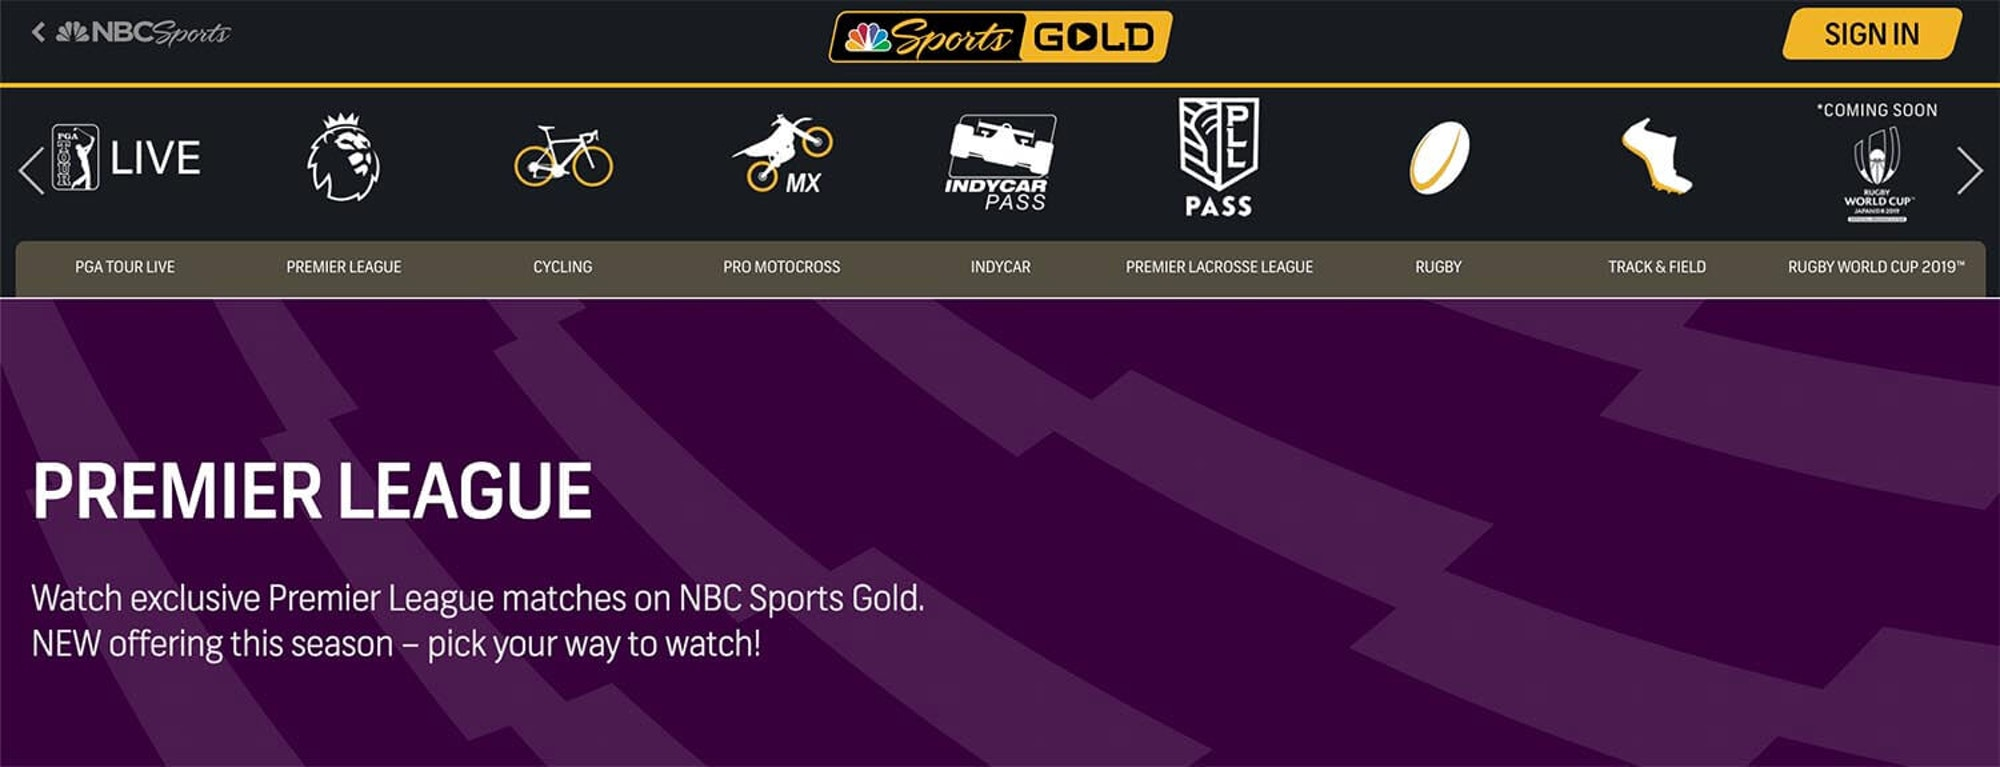 2019-20 premier league manchester united vs liverpool soccer live stream free nbc sports gold